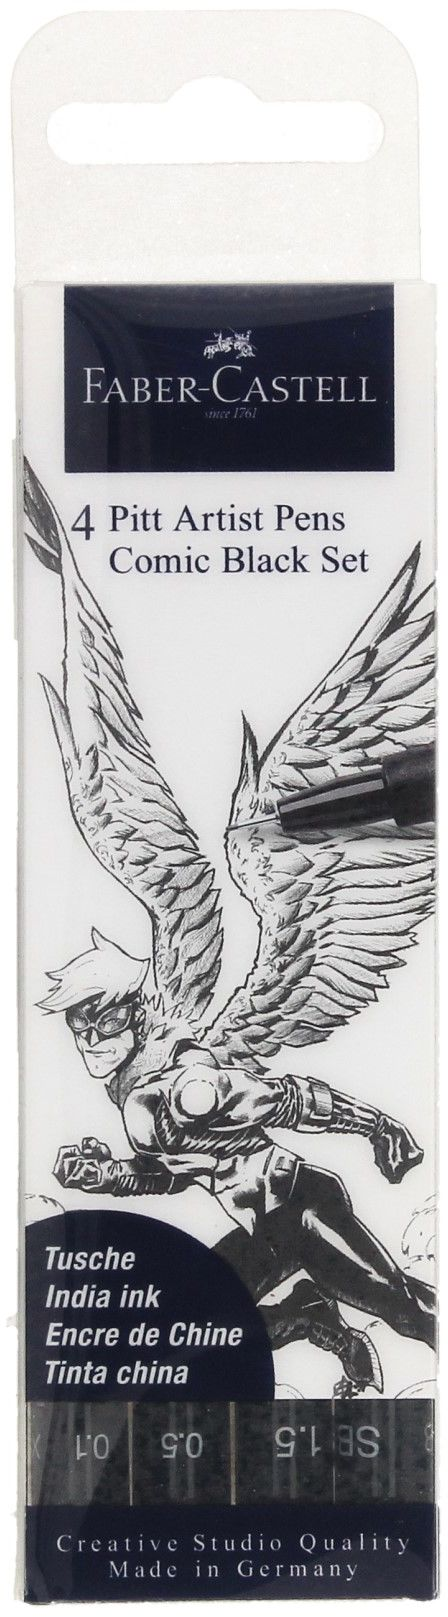 Zestaw Pit Artist do rysowania komiksów (4) The Famazings - Son Faber Castell 267194FC